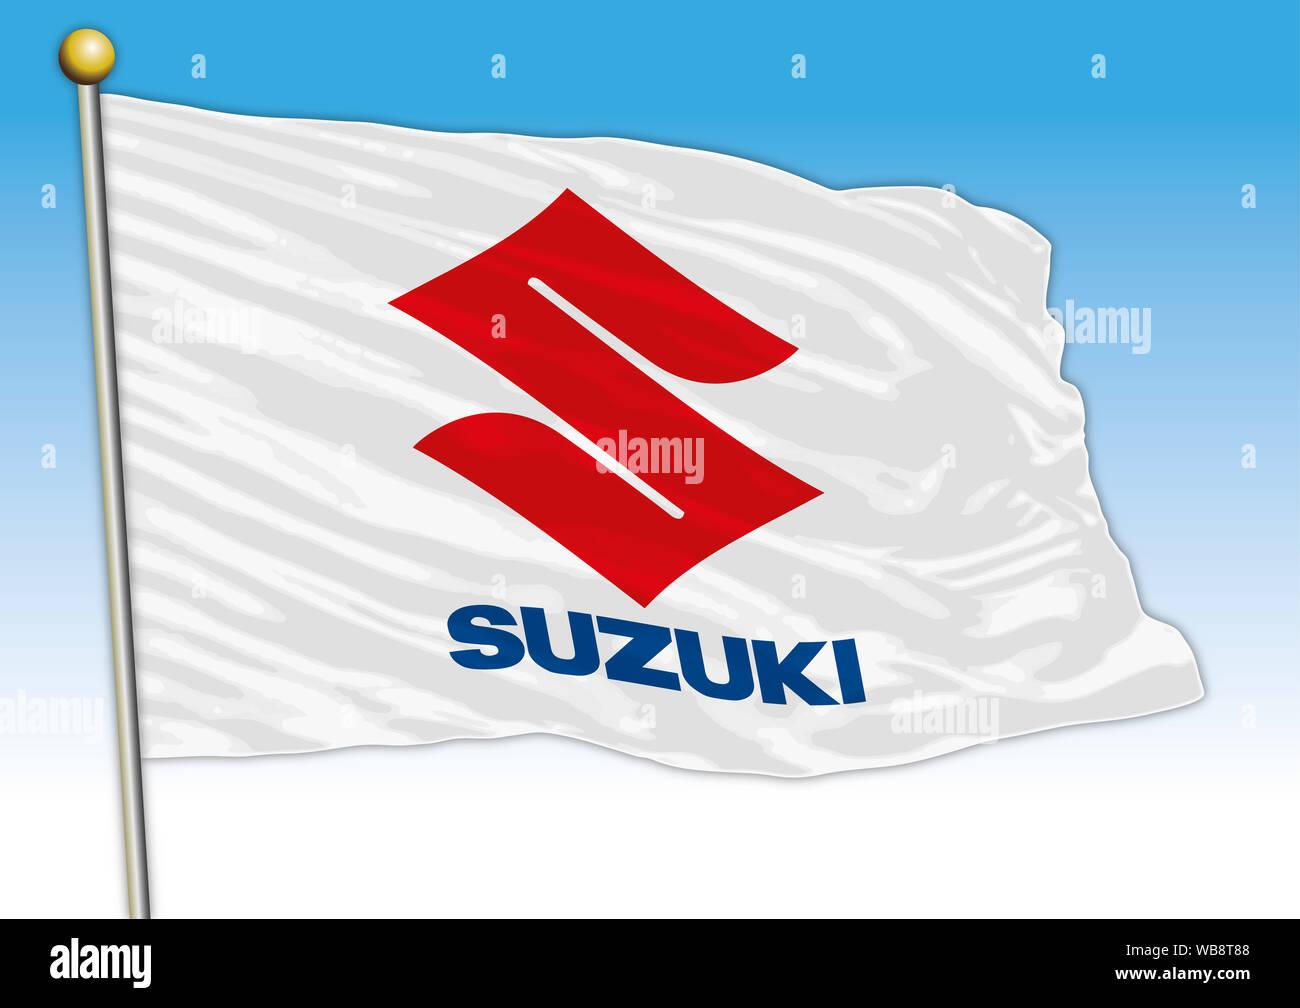 Suzuki car industrial group, flag with logo, illustration Stock Photo